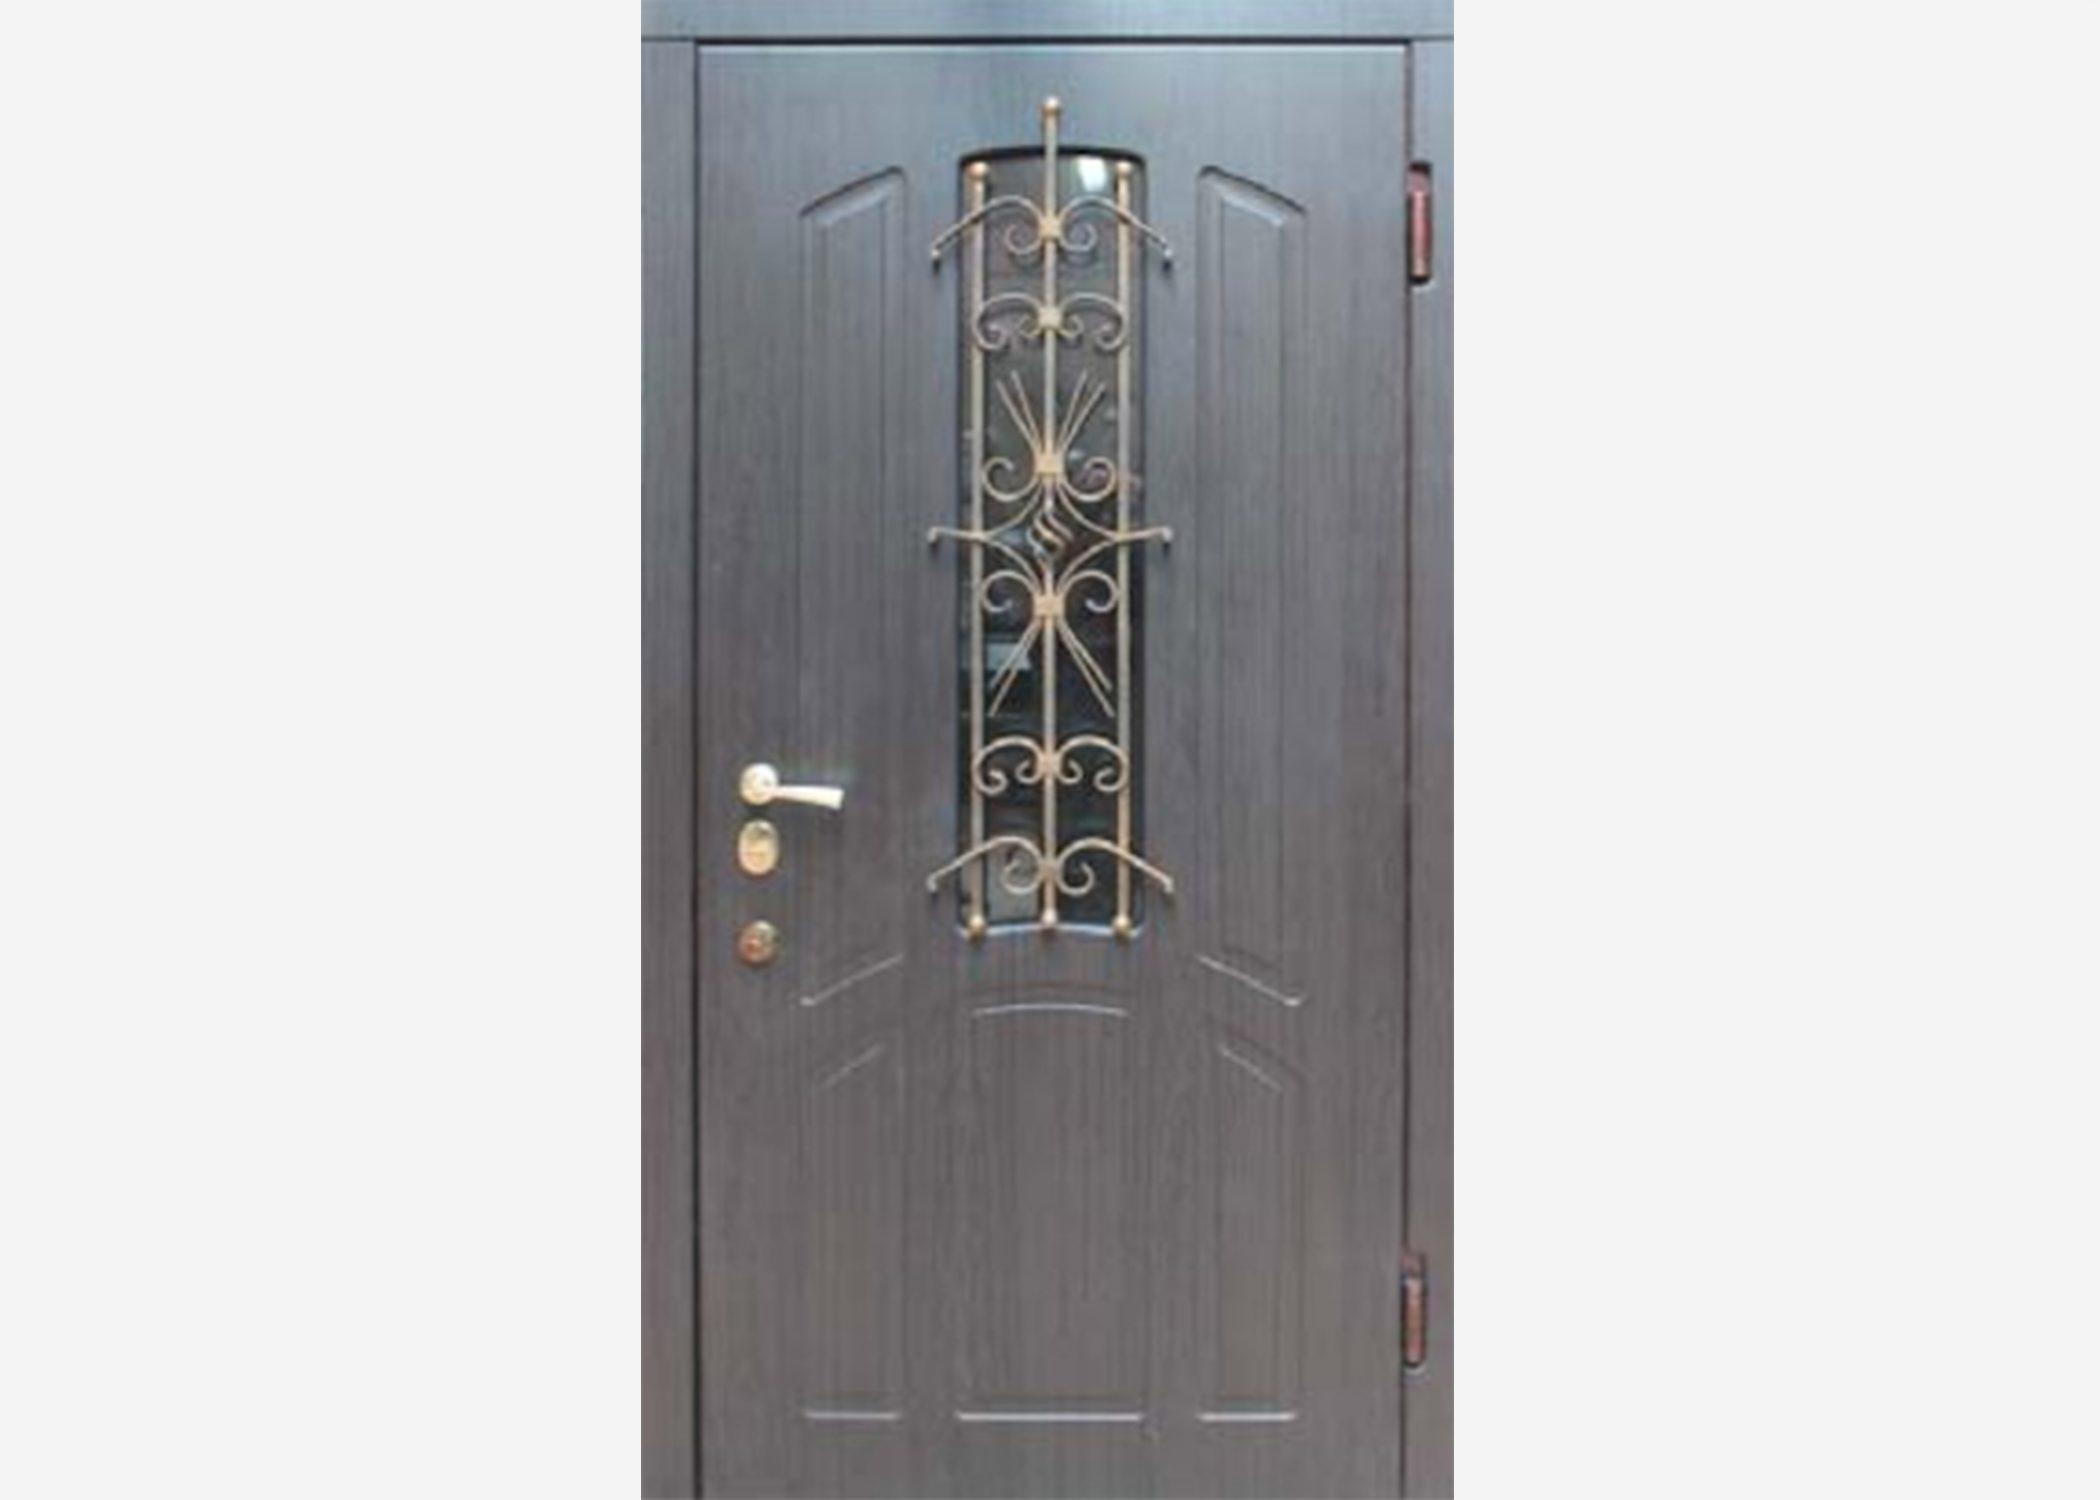 2018 06 13 2 3 - Entry Doors